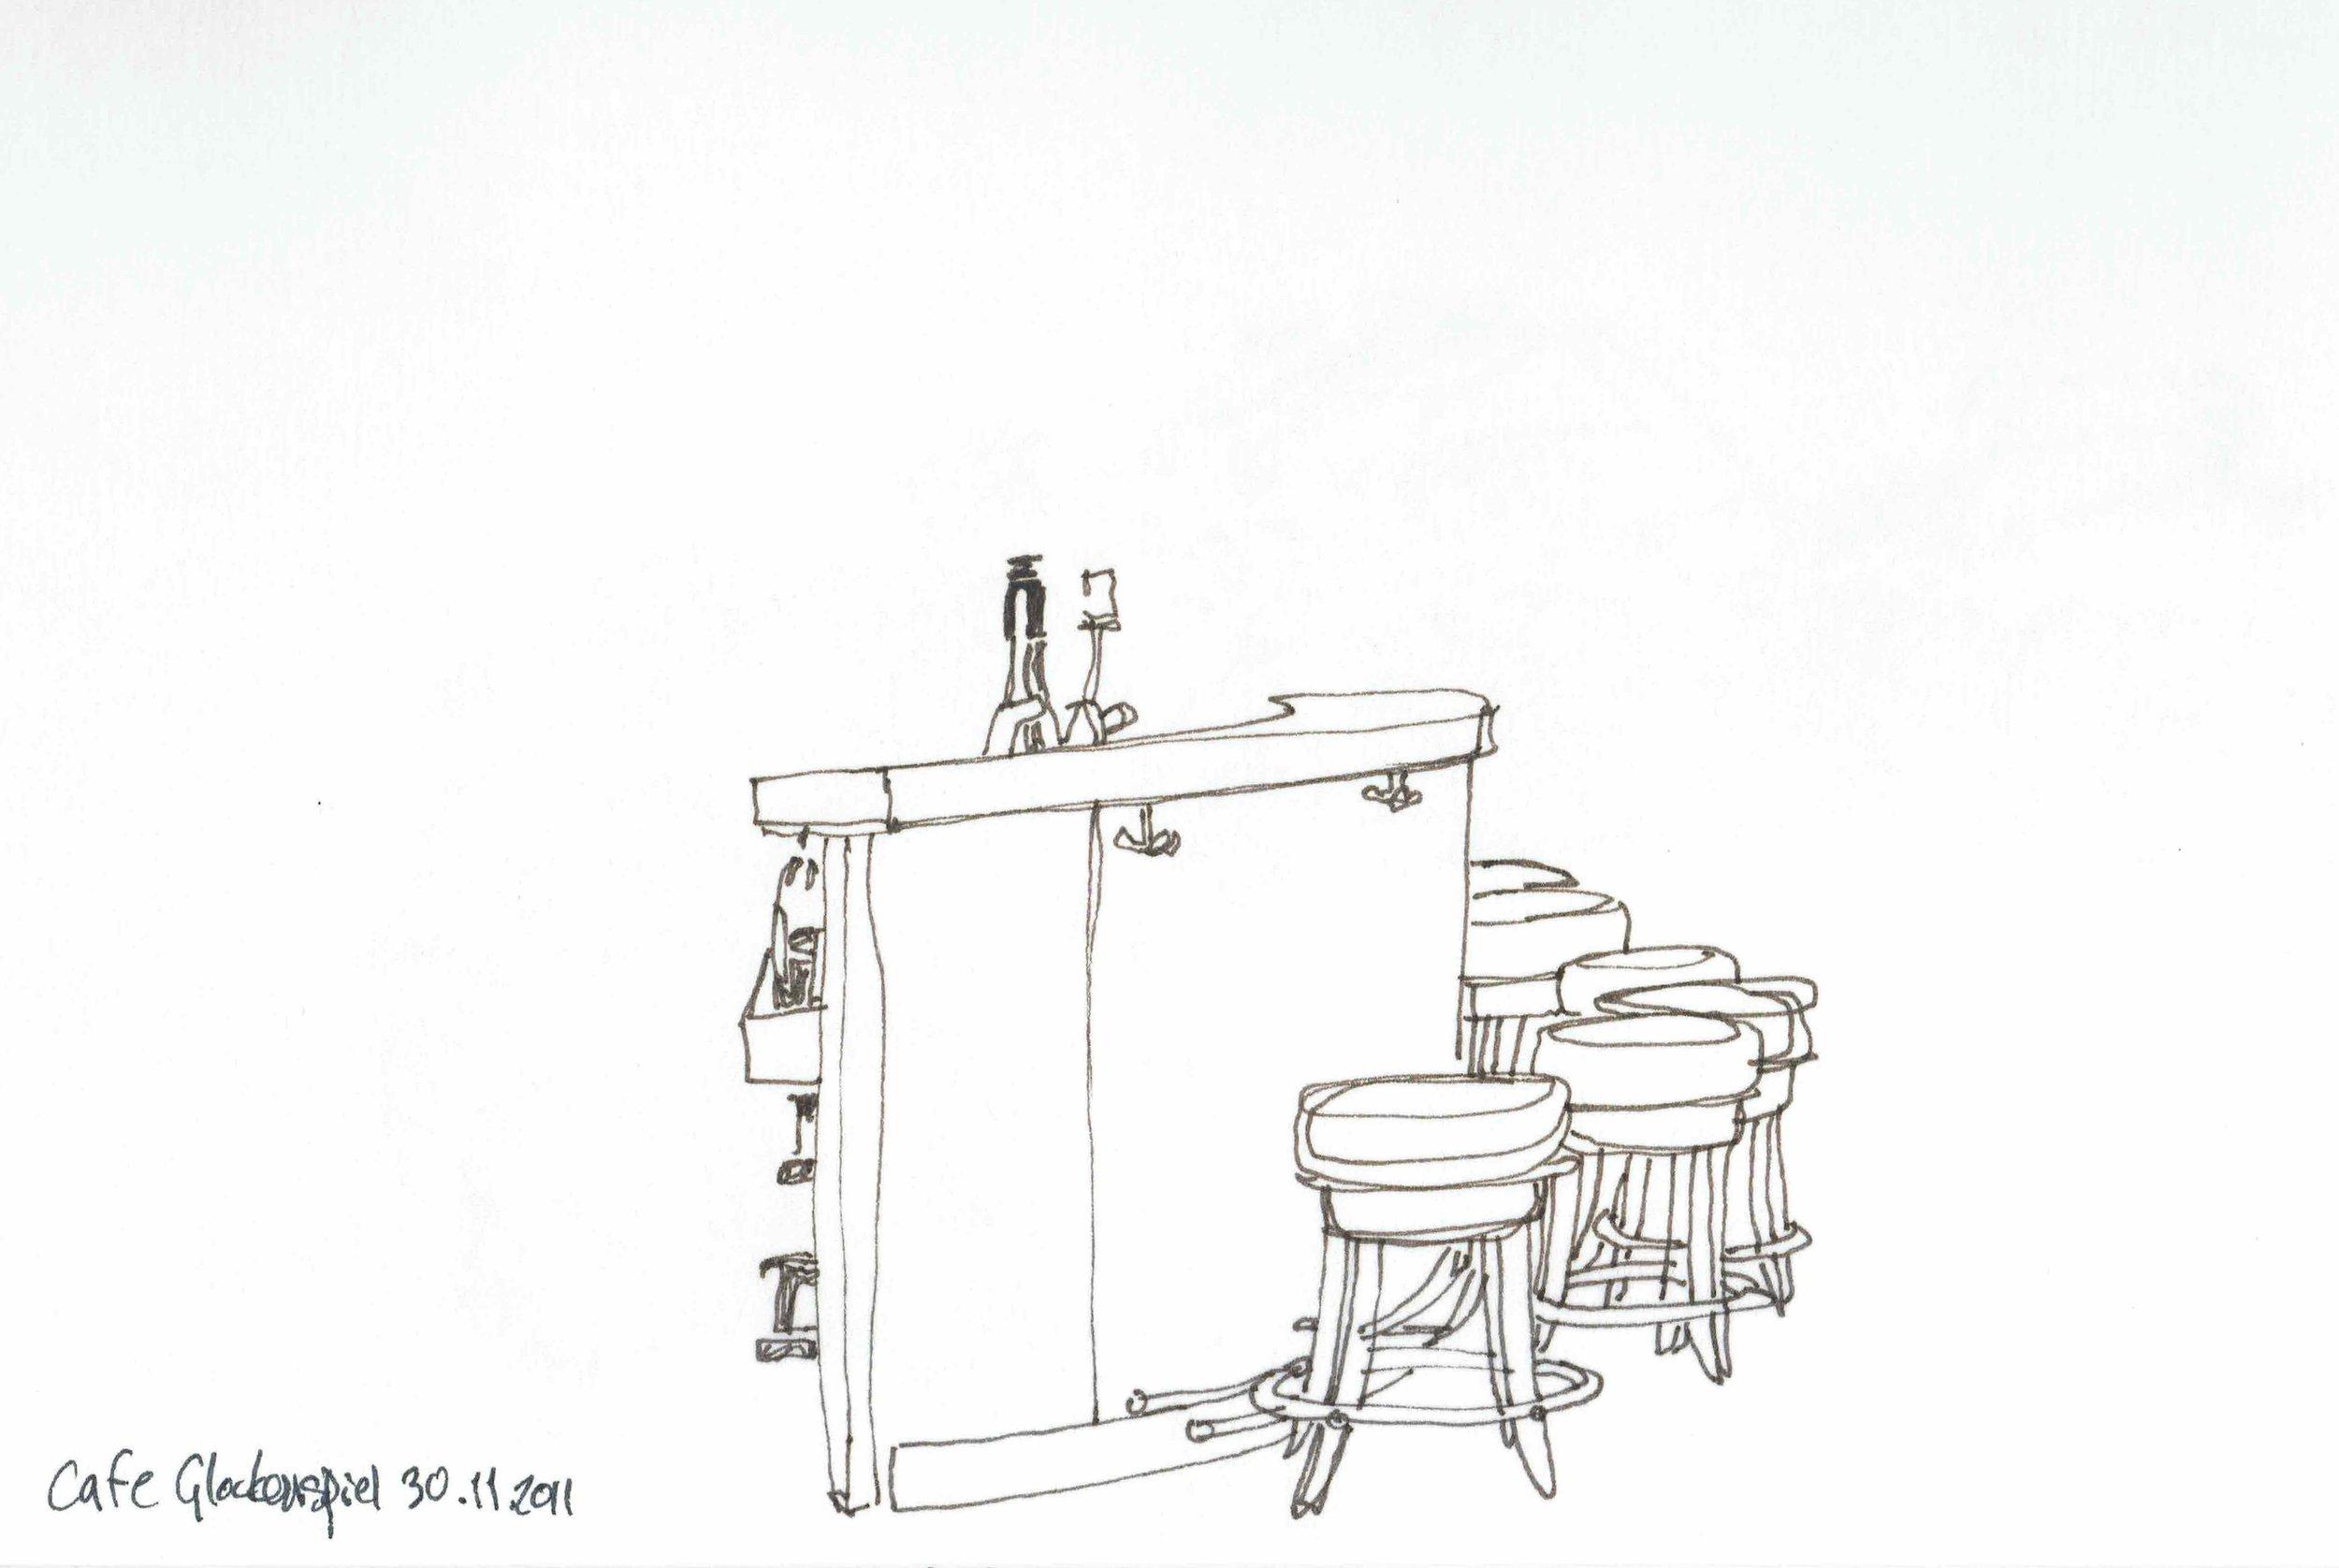 20111130 Cafe Glockenspiel.JPG